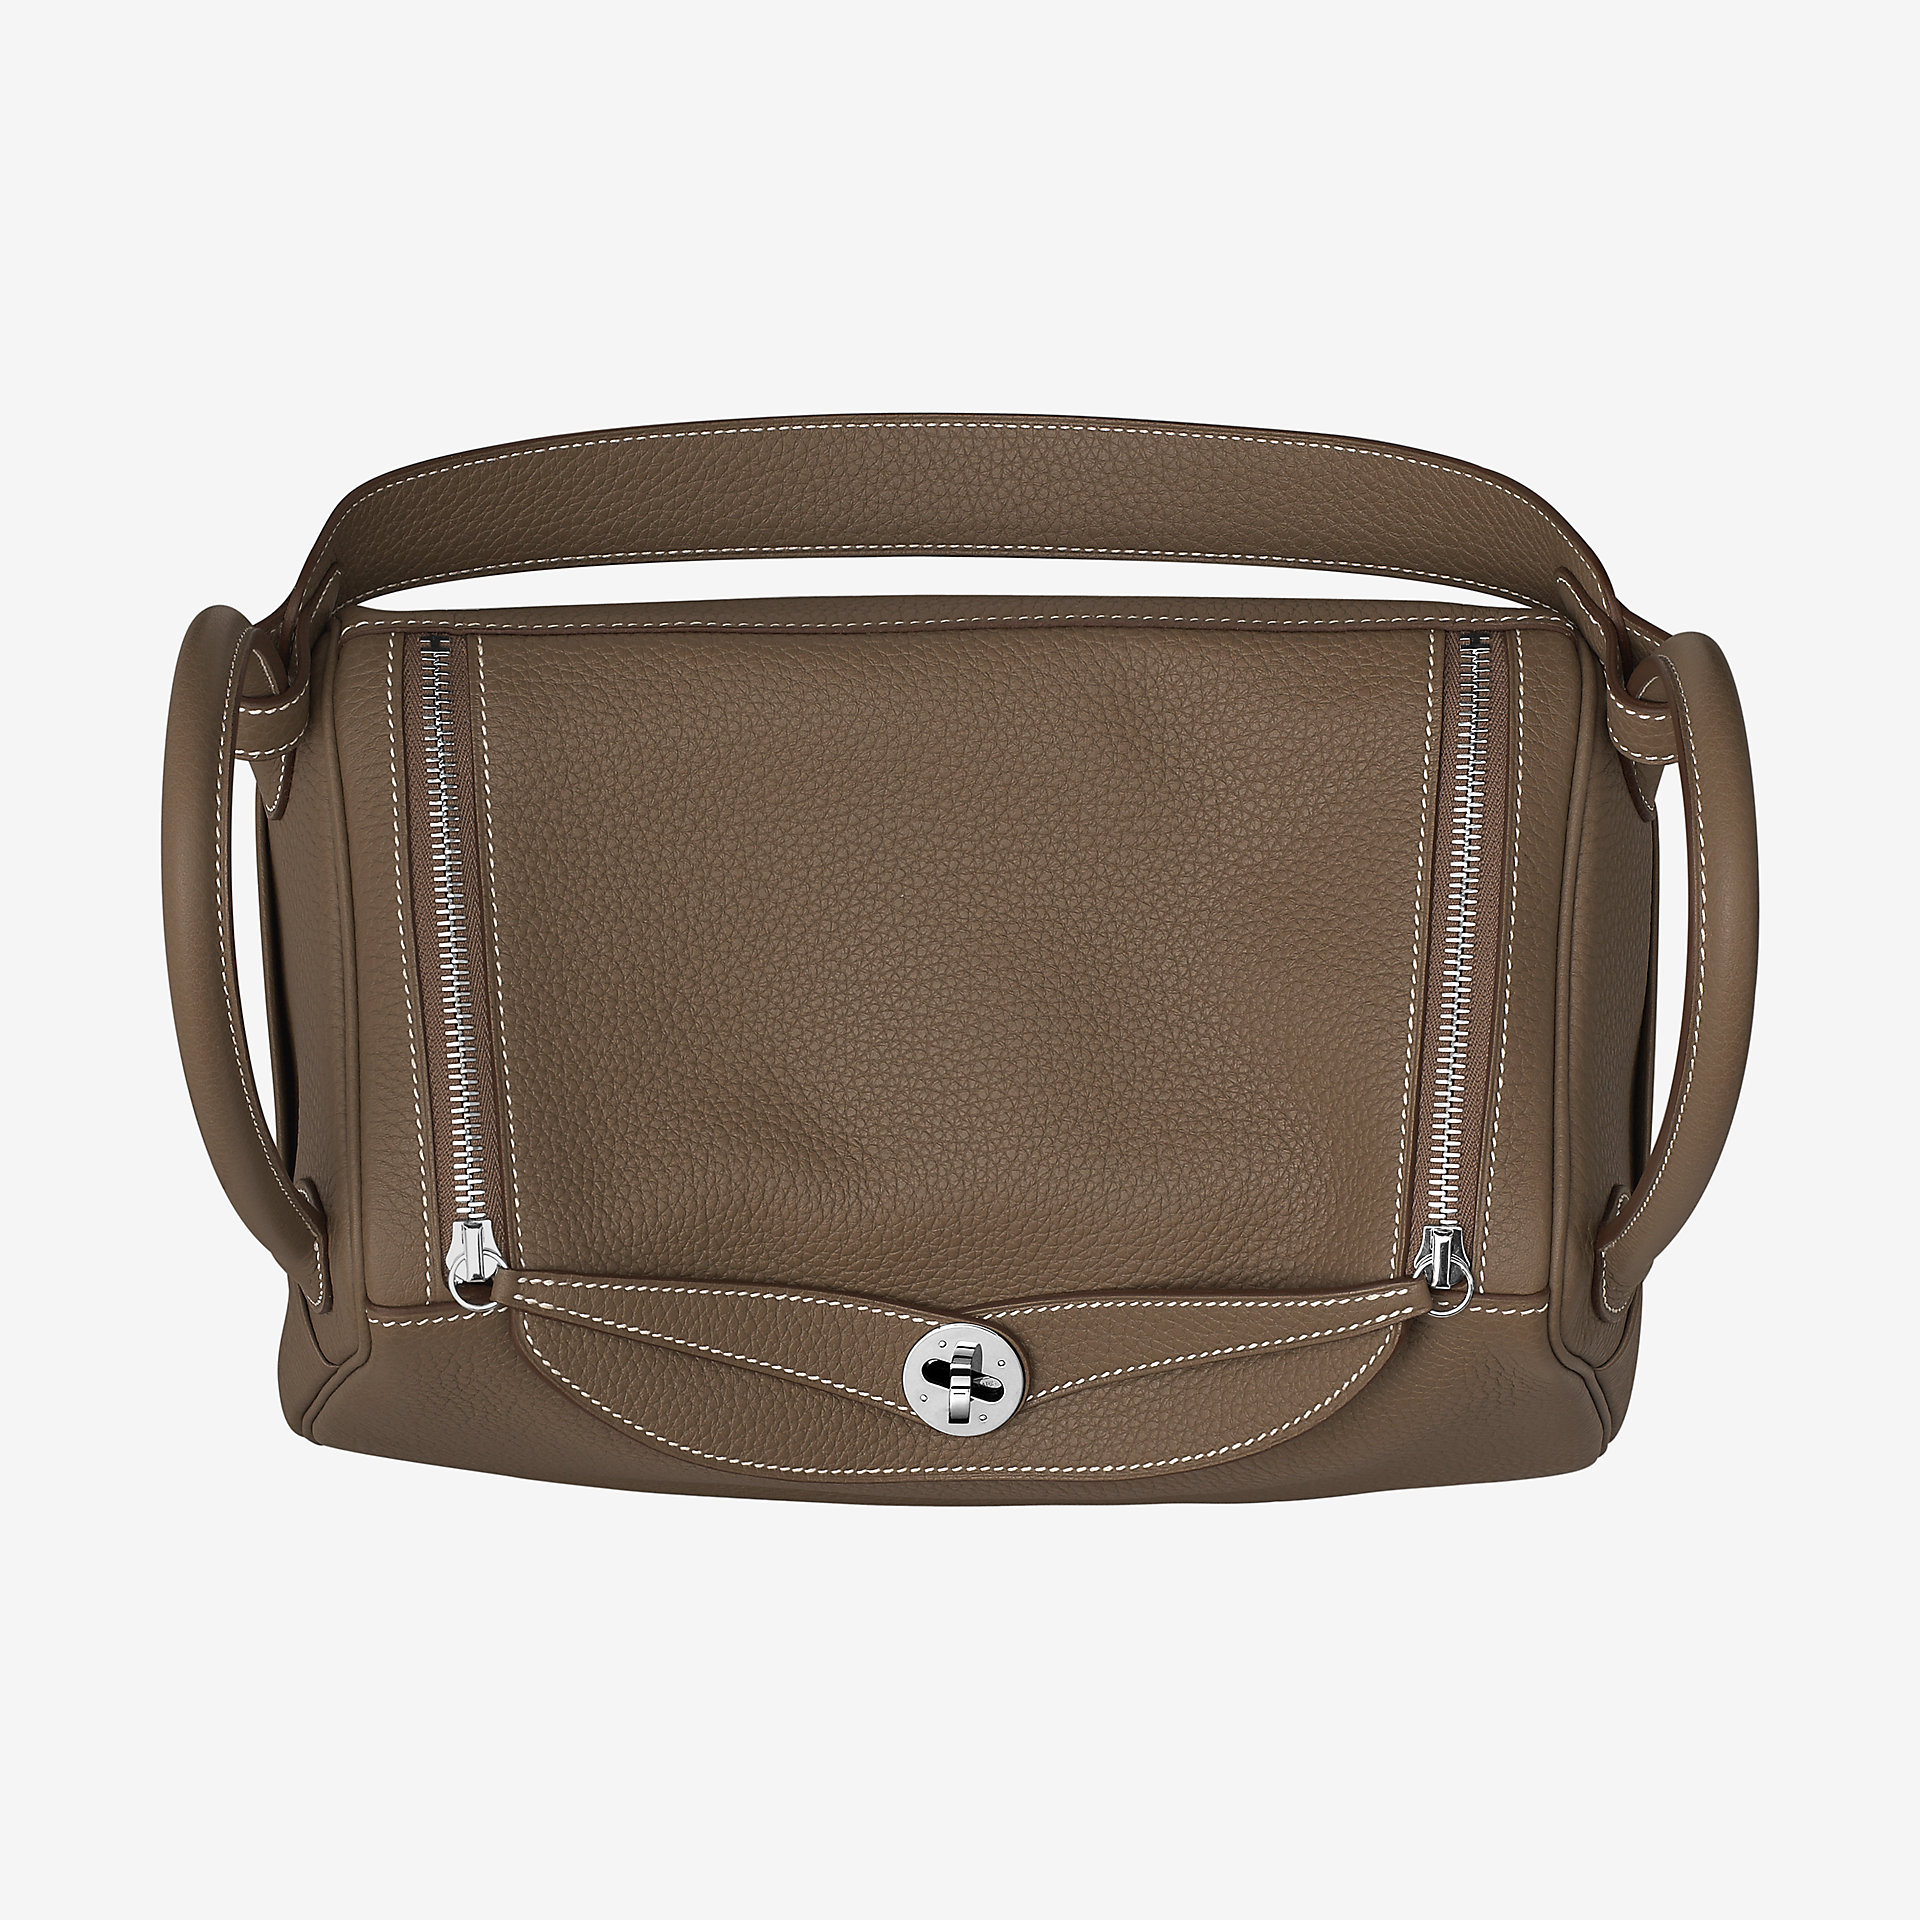 Hermes Lindy琳迪包 30 bag CK18 大象灰 taurillon Clemence leather